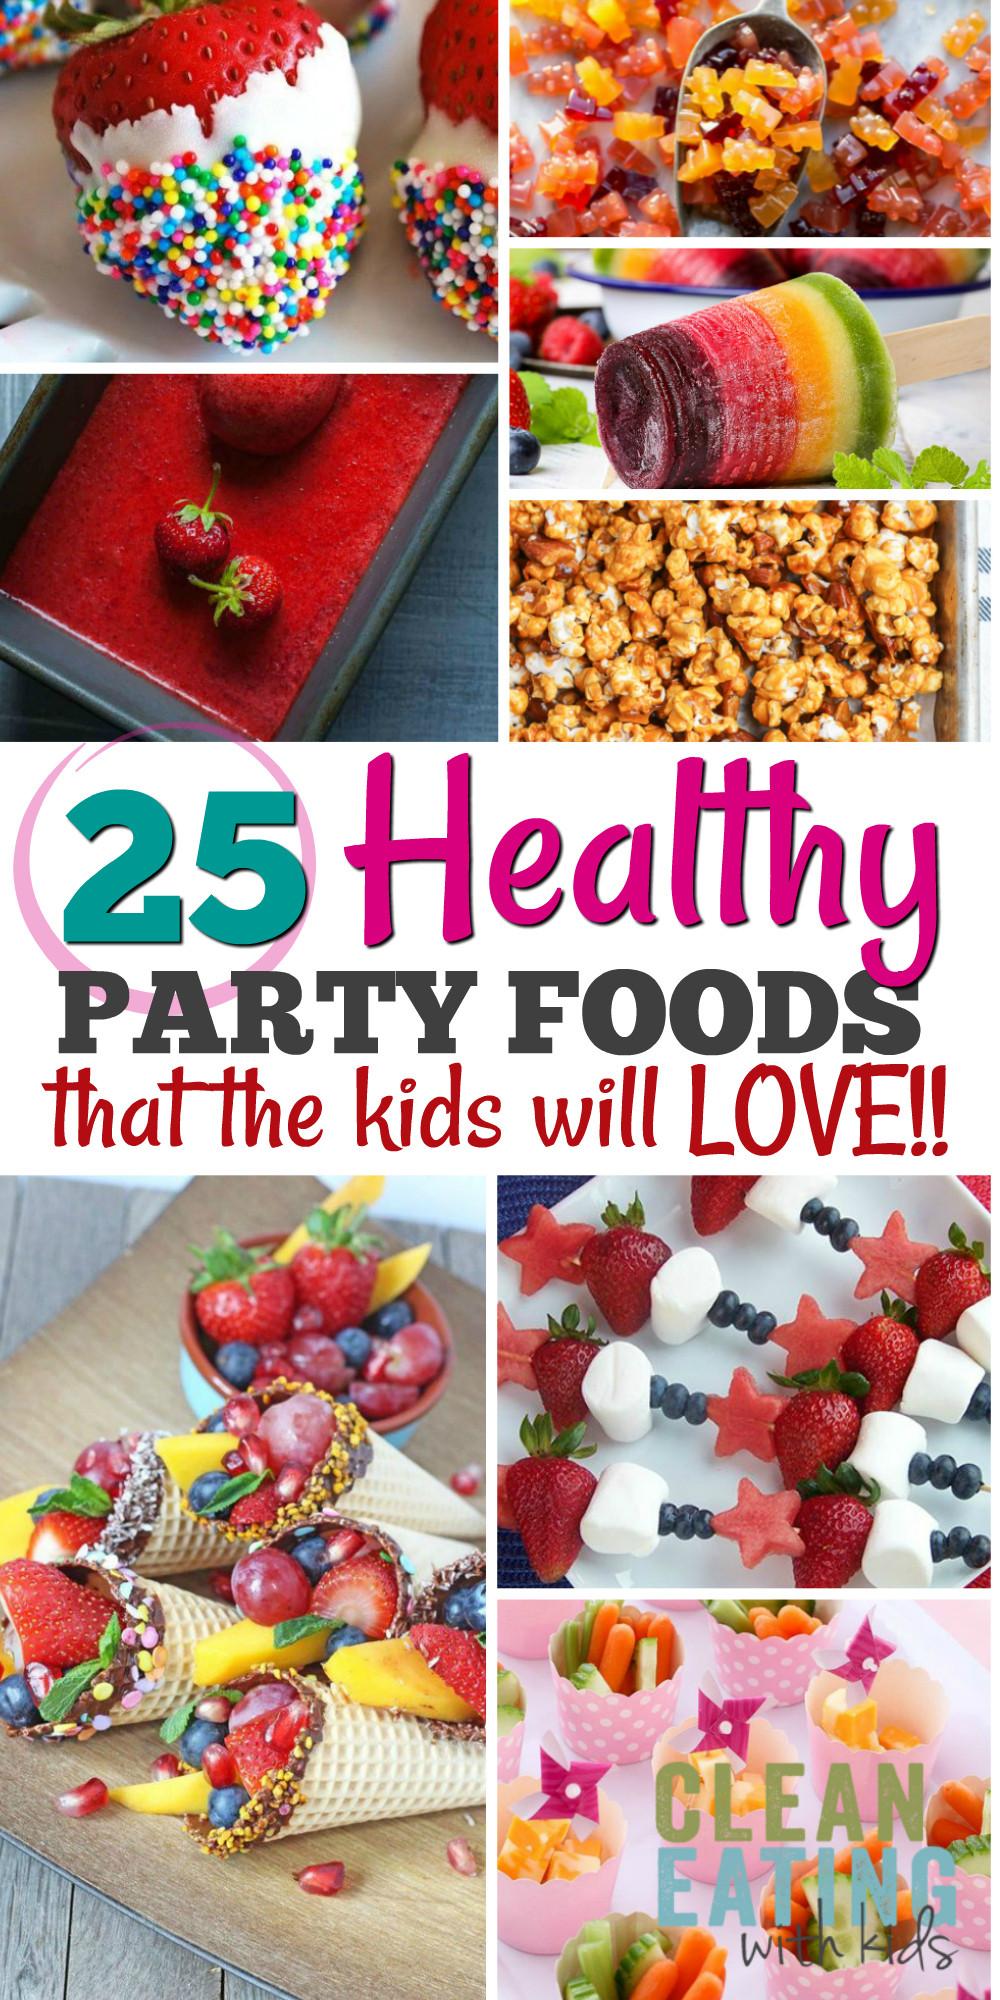 Children Birthday Party Food Ideas  25 Healthy Birthday Party Food Ideas Clean Eating with kids